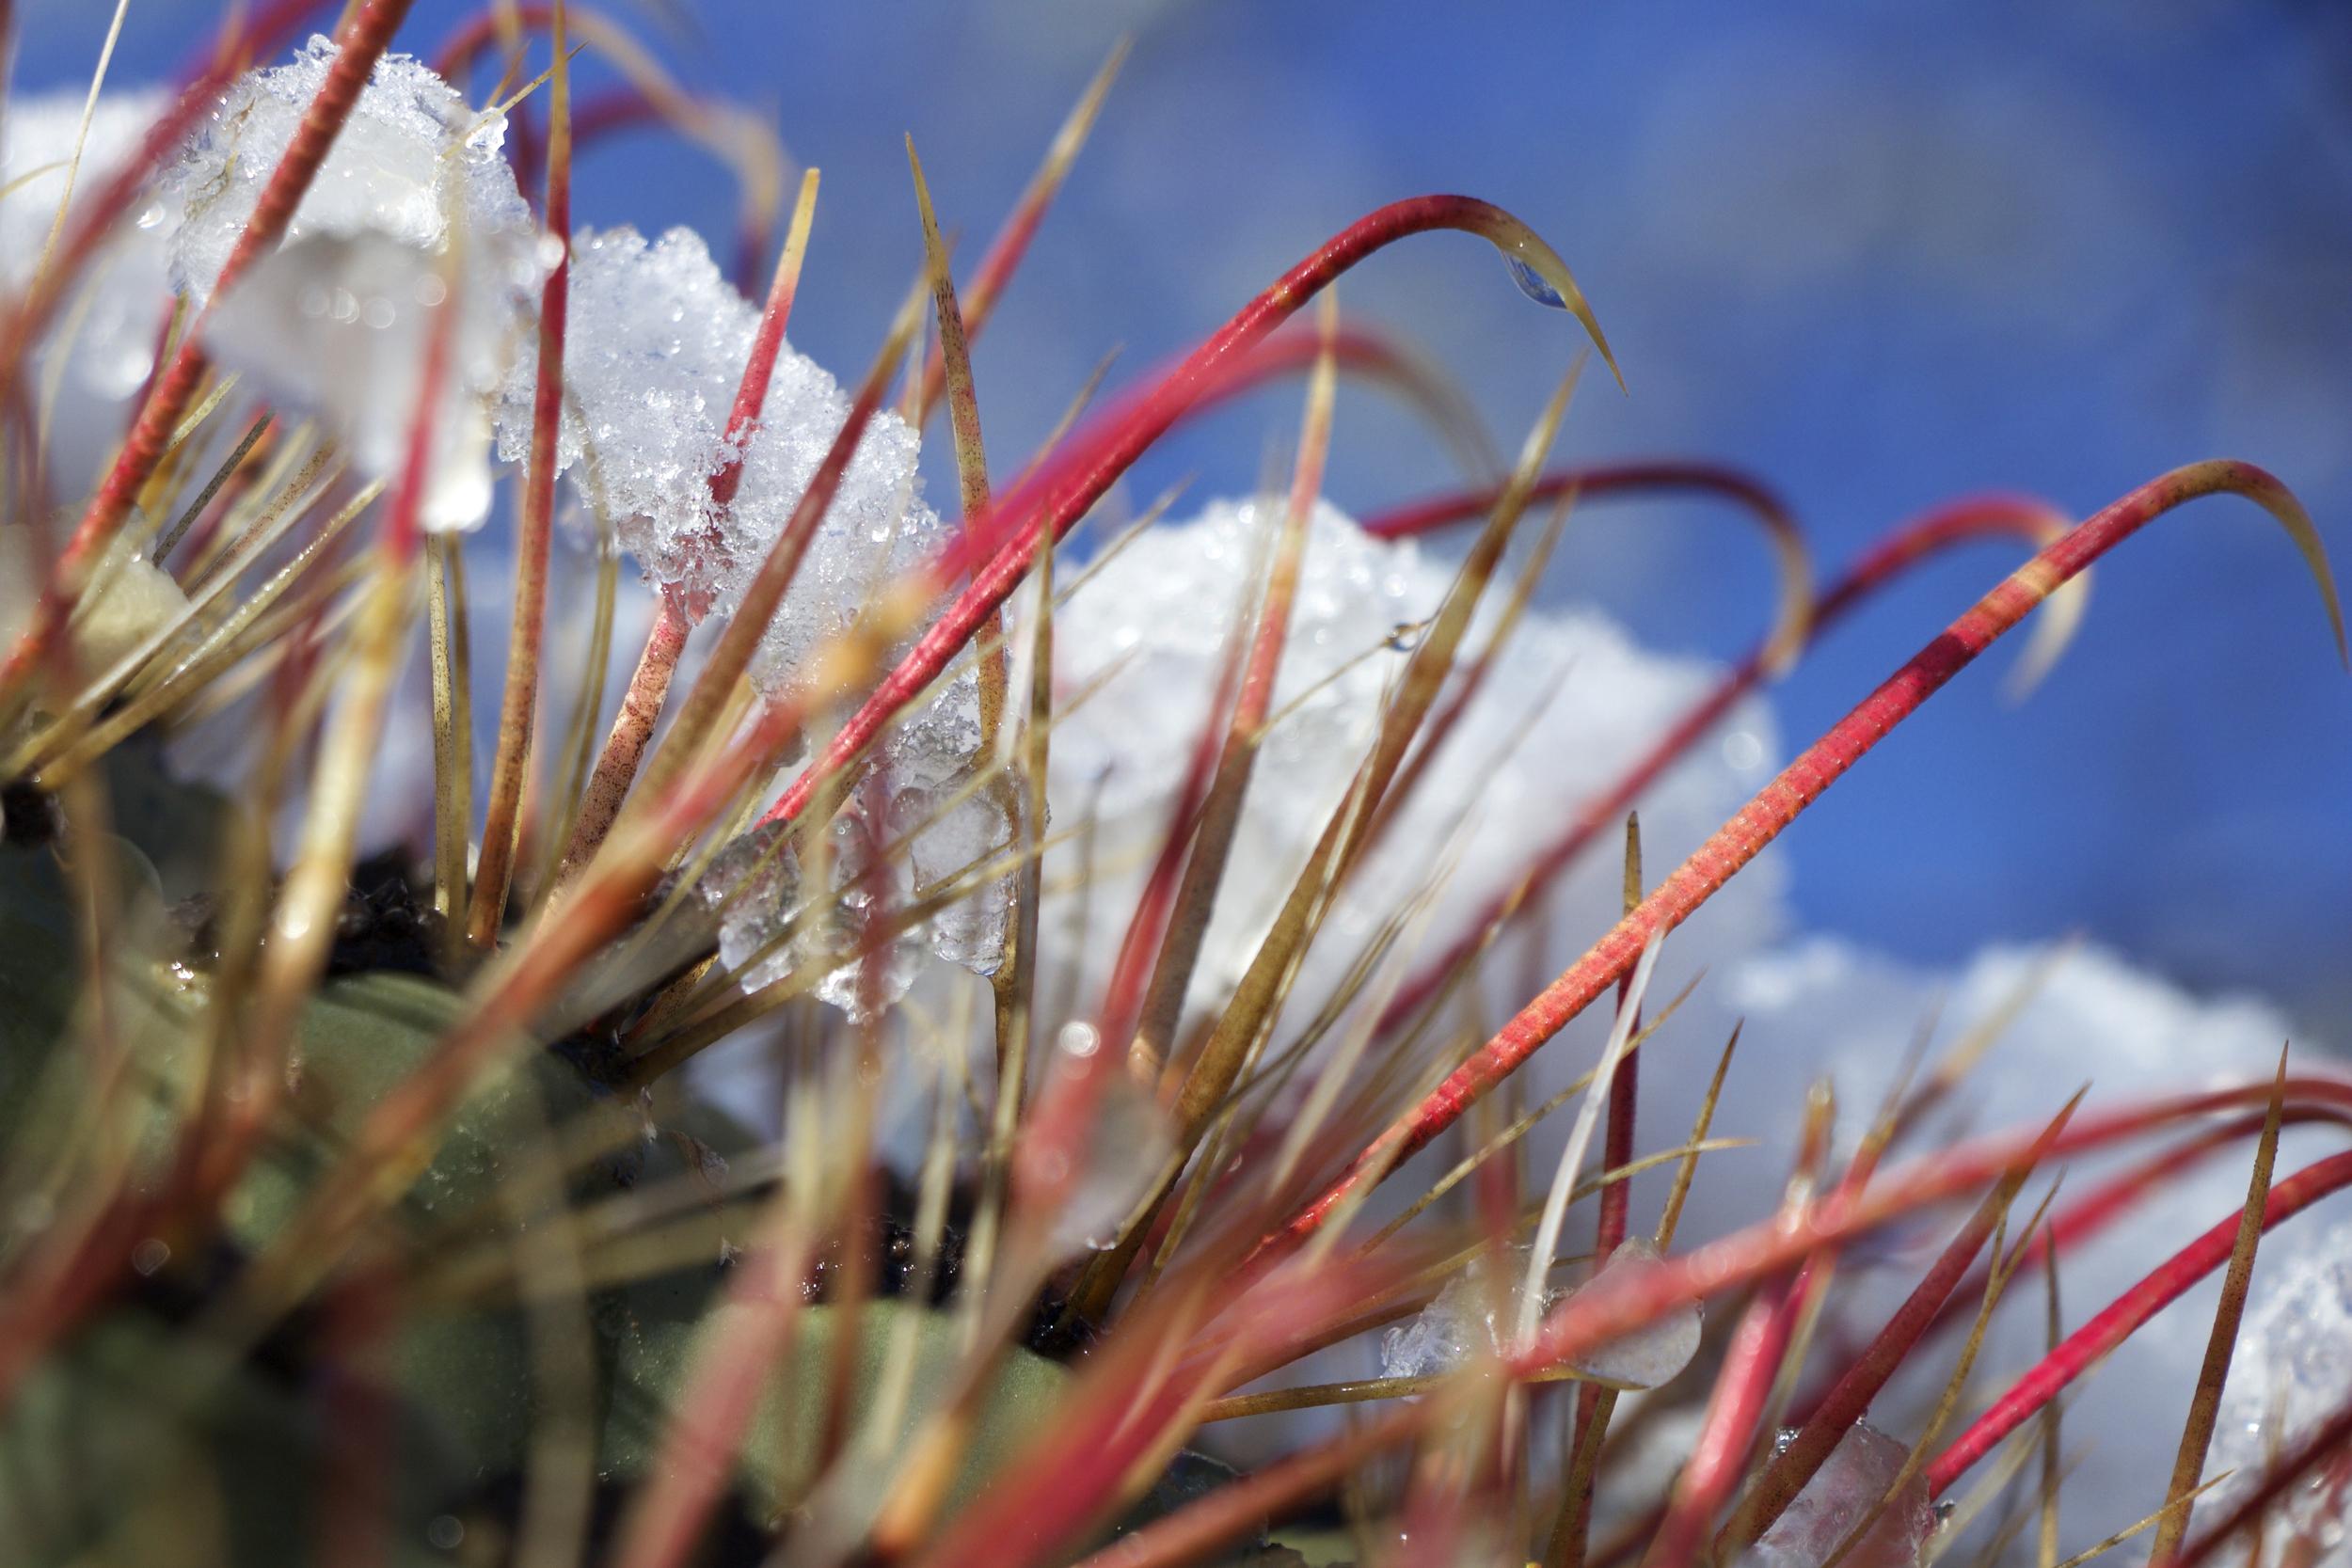 """Melting Snow on Fishhook Cactus #3"""